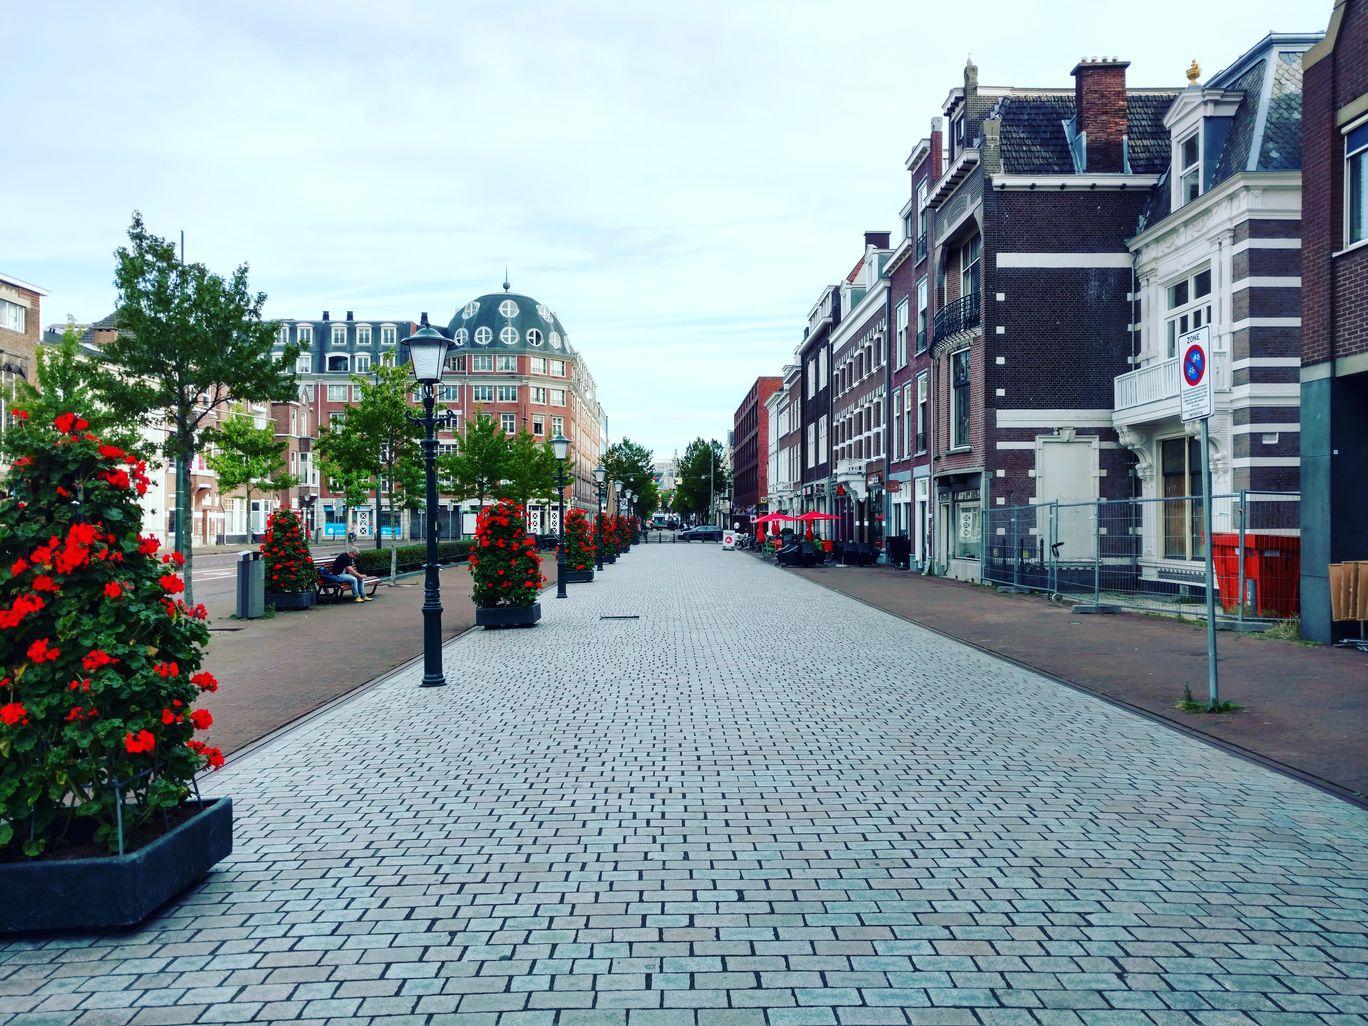 Photo of The Hague By Abhishek Kumar